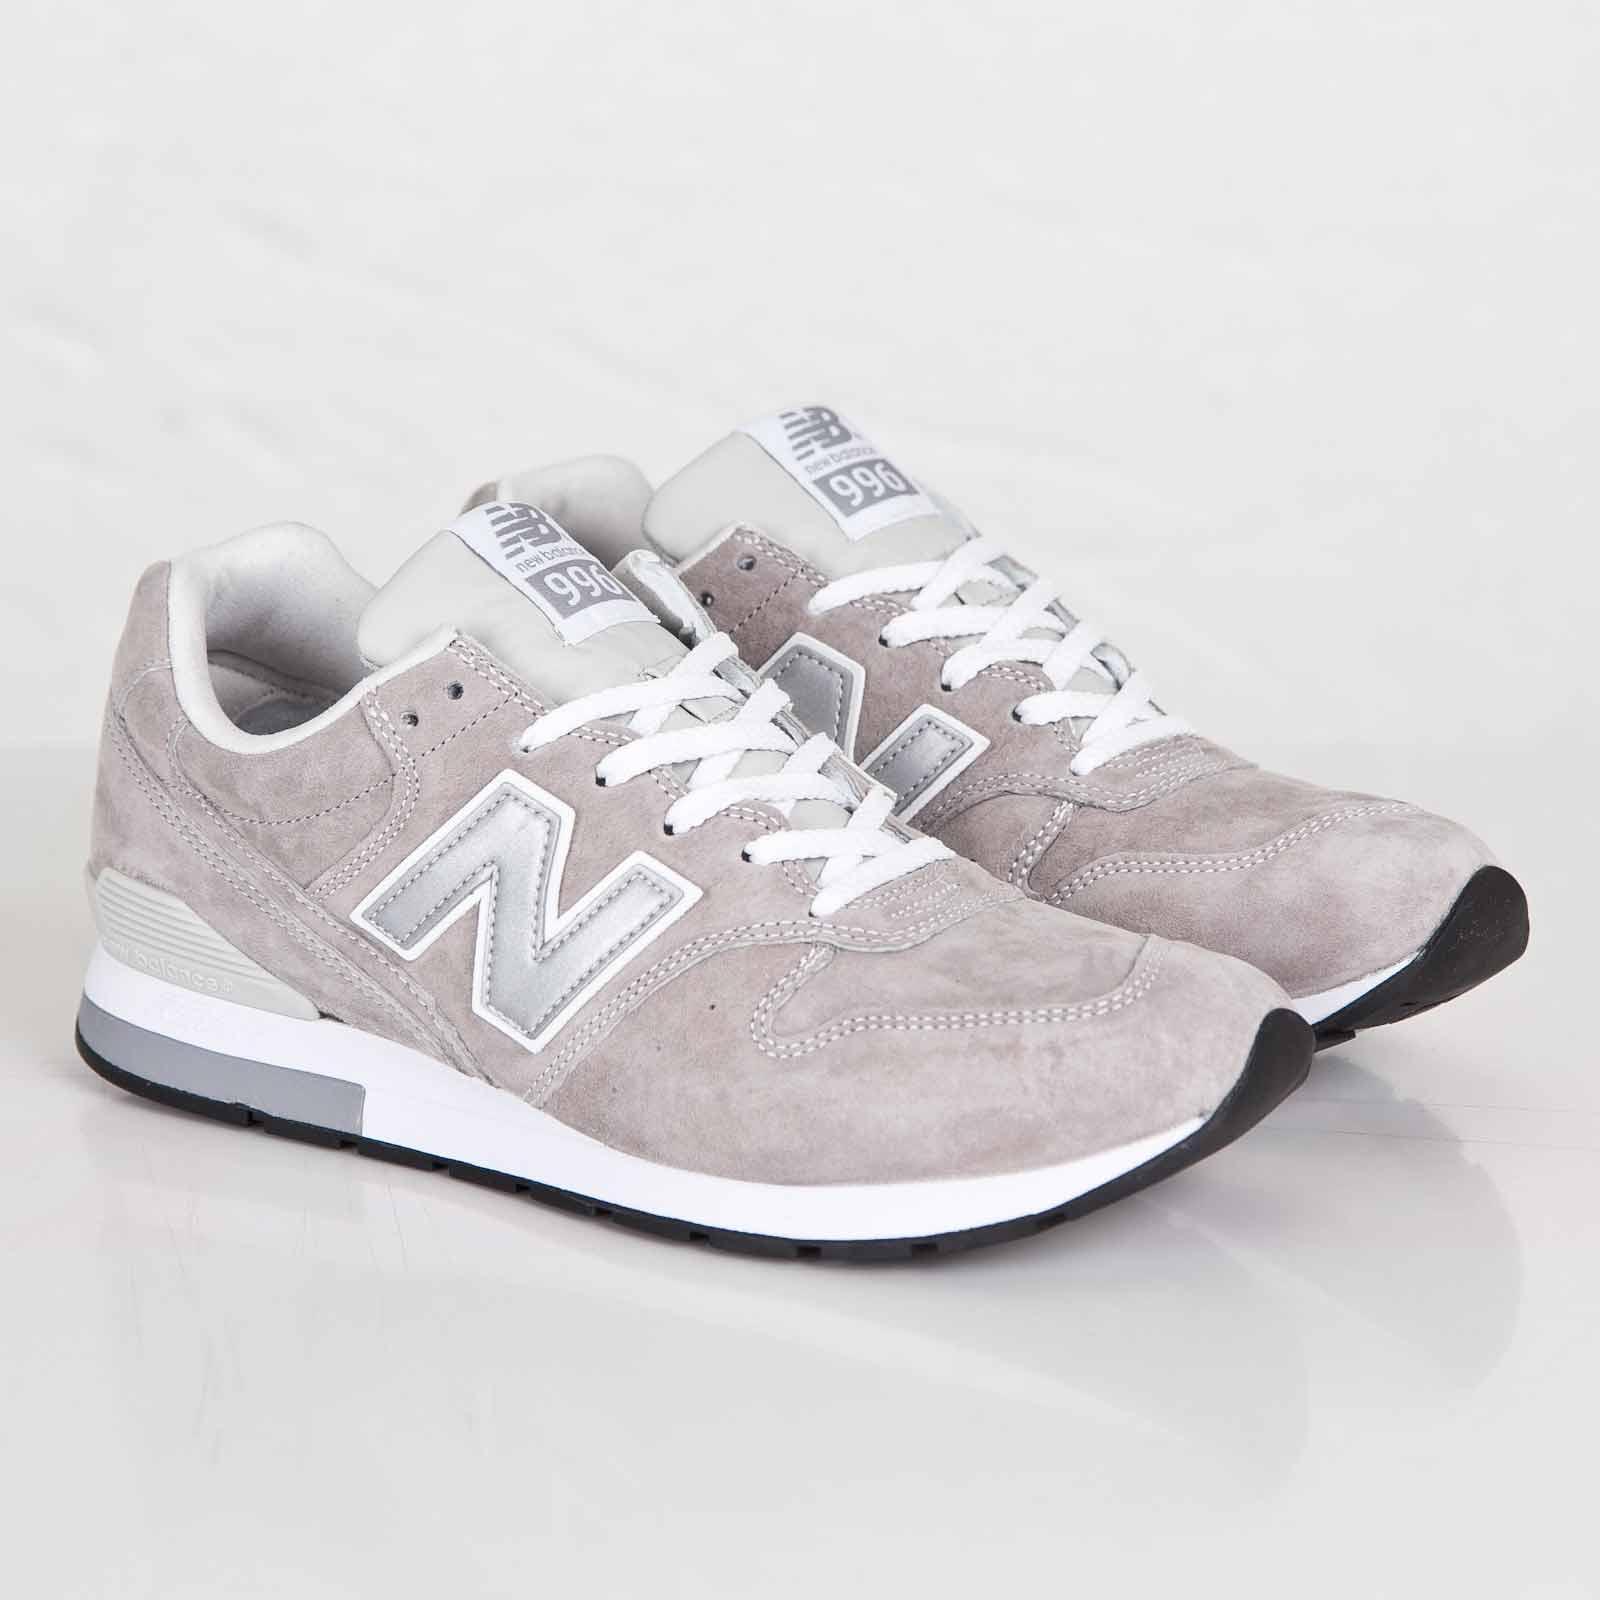 new arrivals 8878e 59483 New Balance MRL996 - Mrl996dg - Sneakersnstuff | sneakers ...